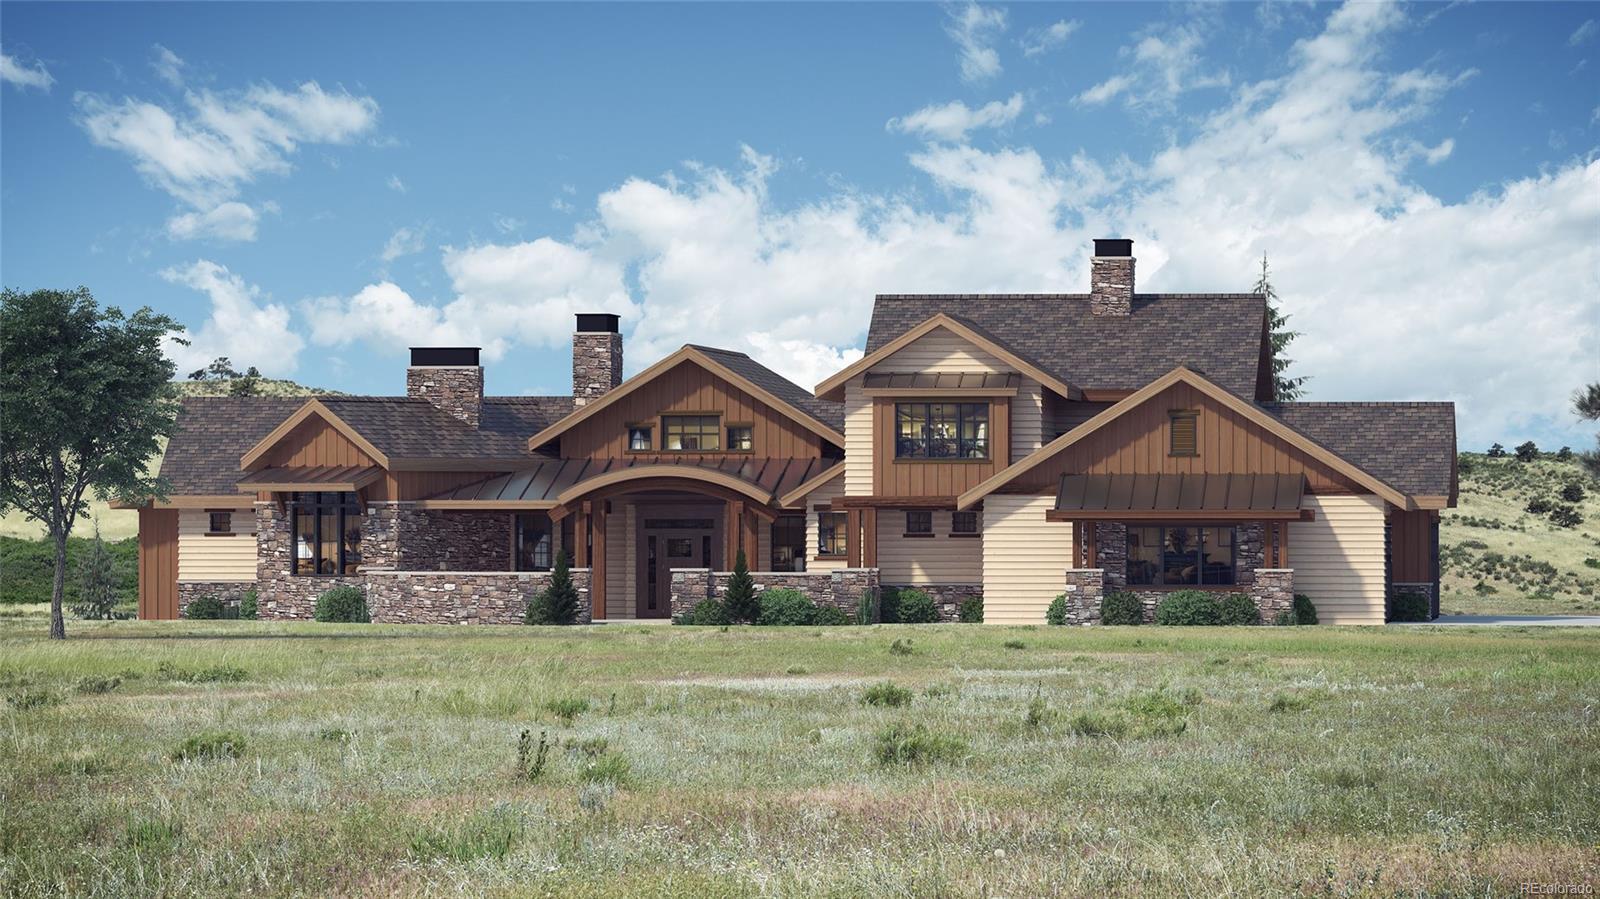 4151 Wilderland Way, Loveland, CO 80538 - Loveland, CO real estate listing